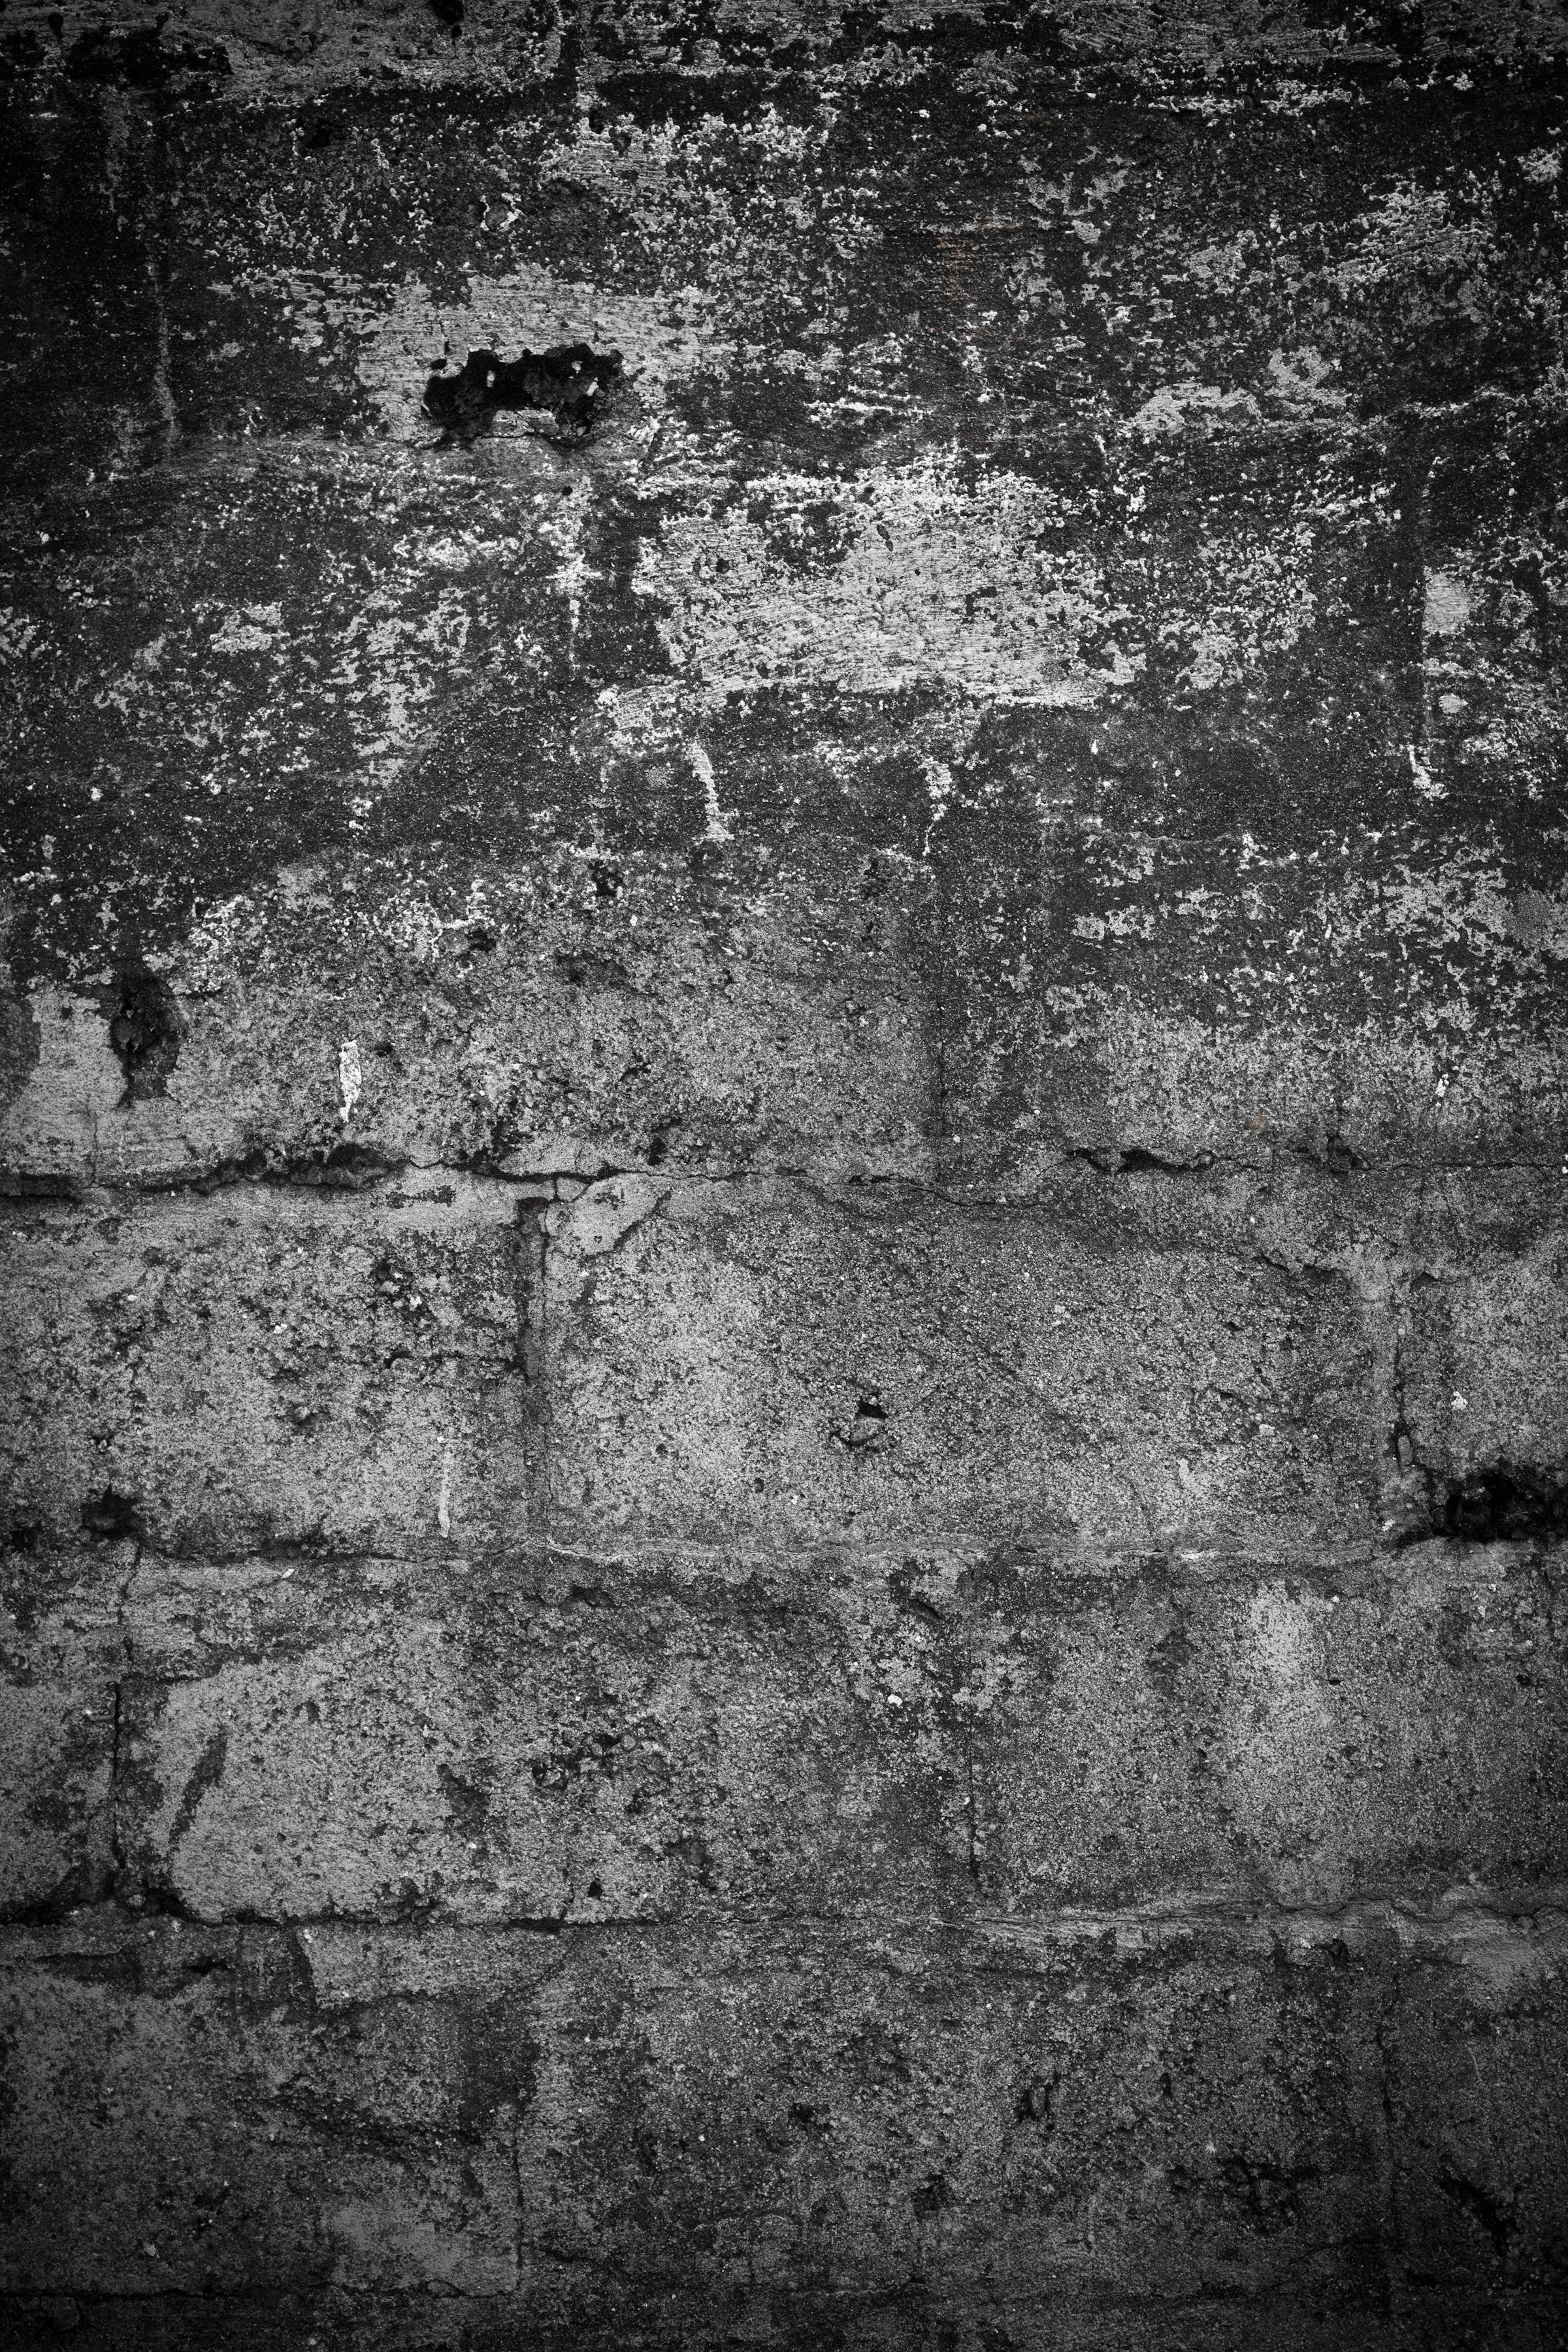 Old worn stone wall photo